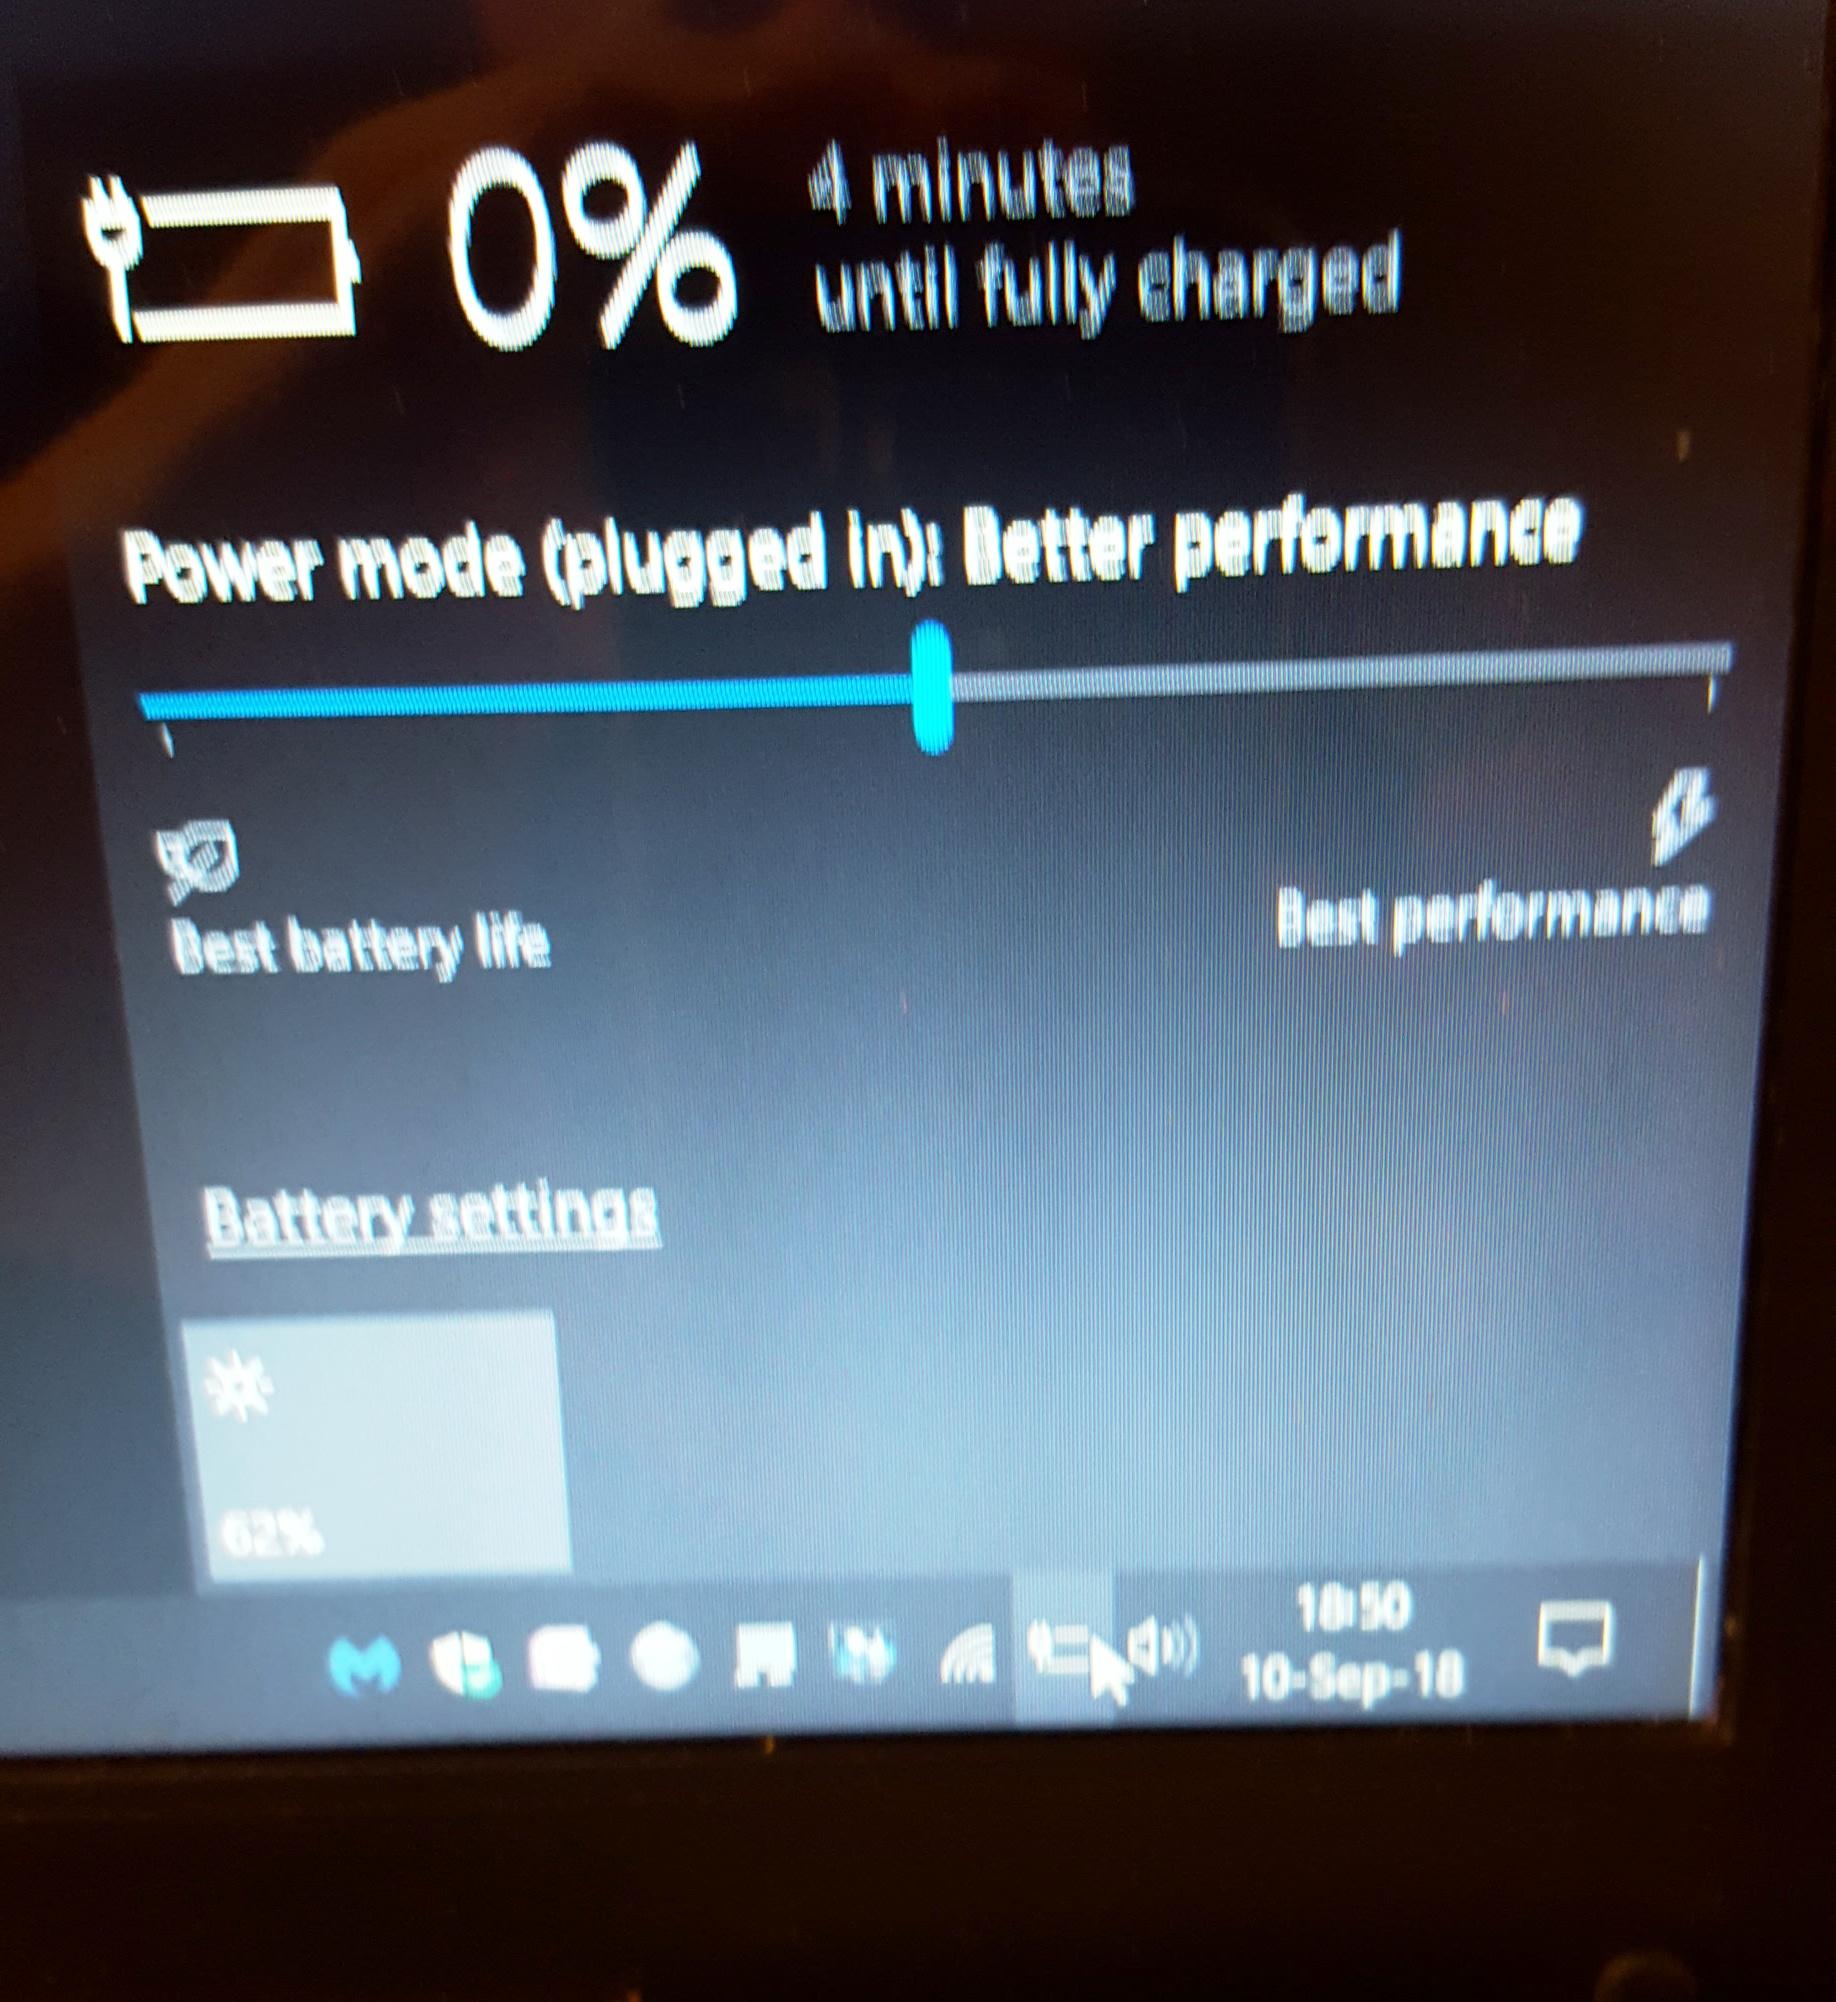 New Laptop Battery Not Charging - Microsoft Community